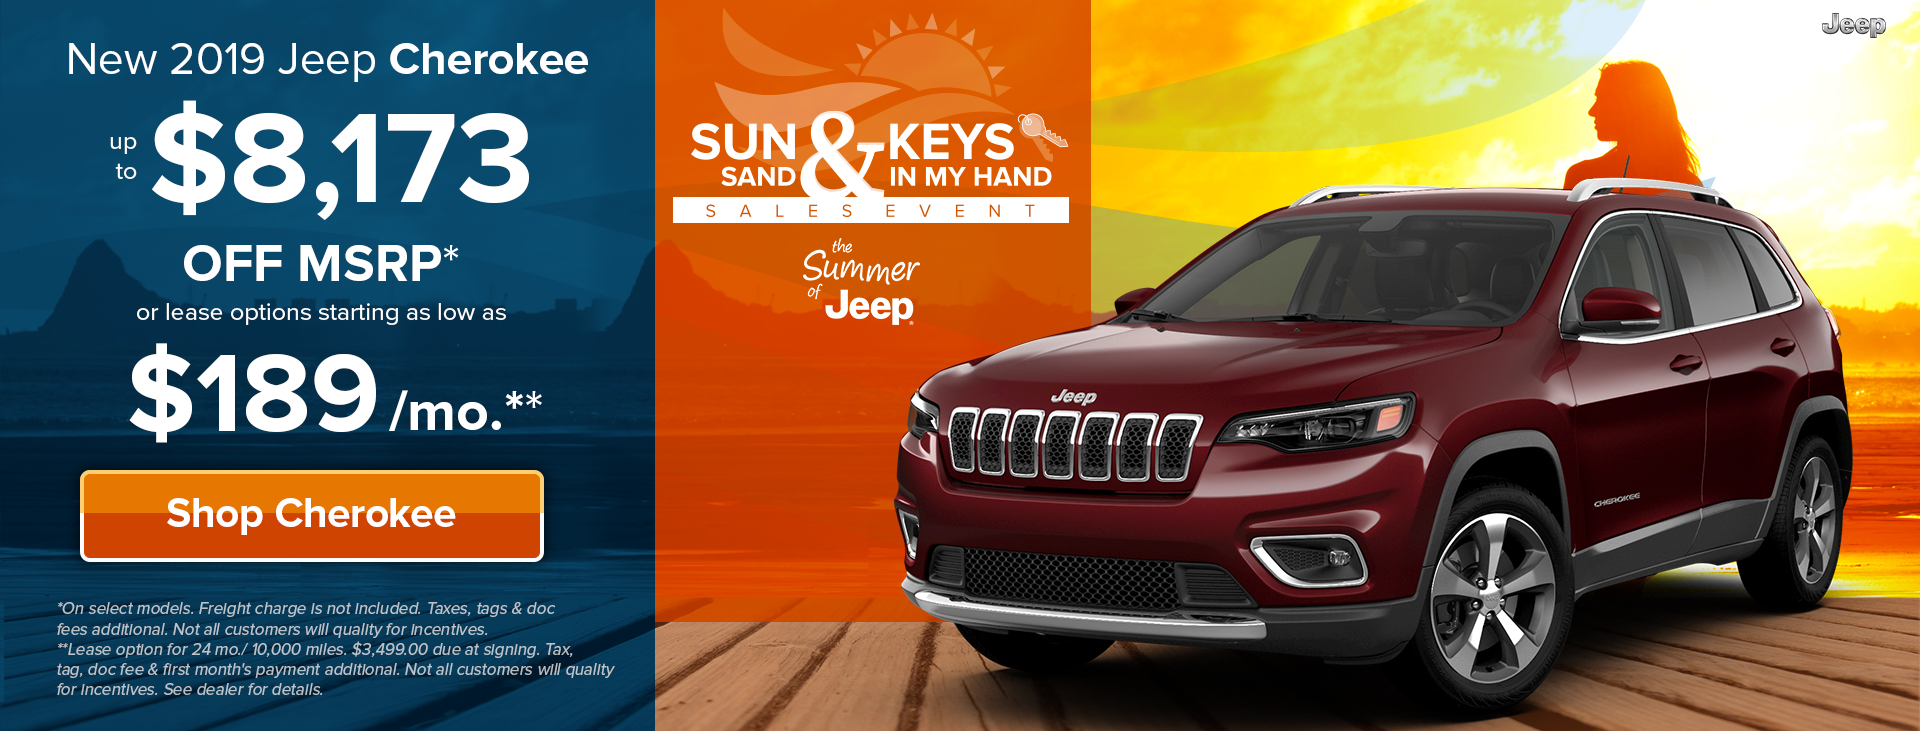 Sun, Sand & Jeep Keys